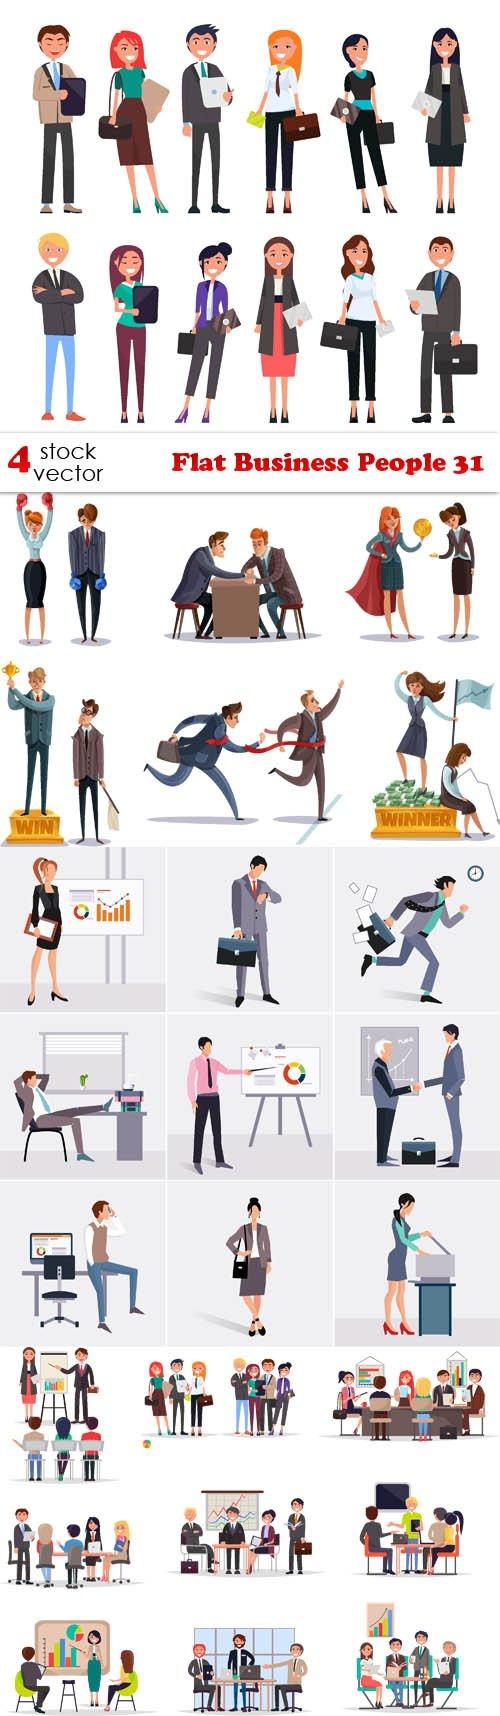 Vectors - Flat Business People 31